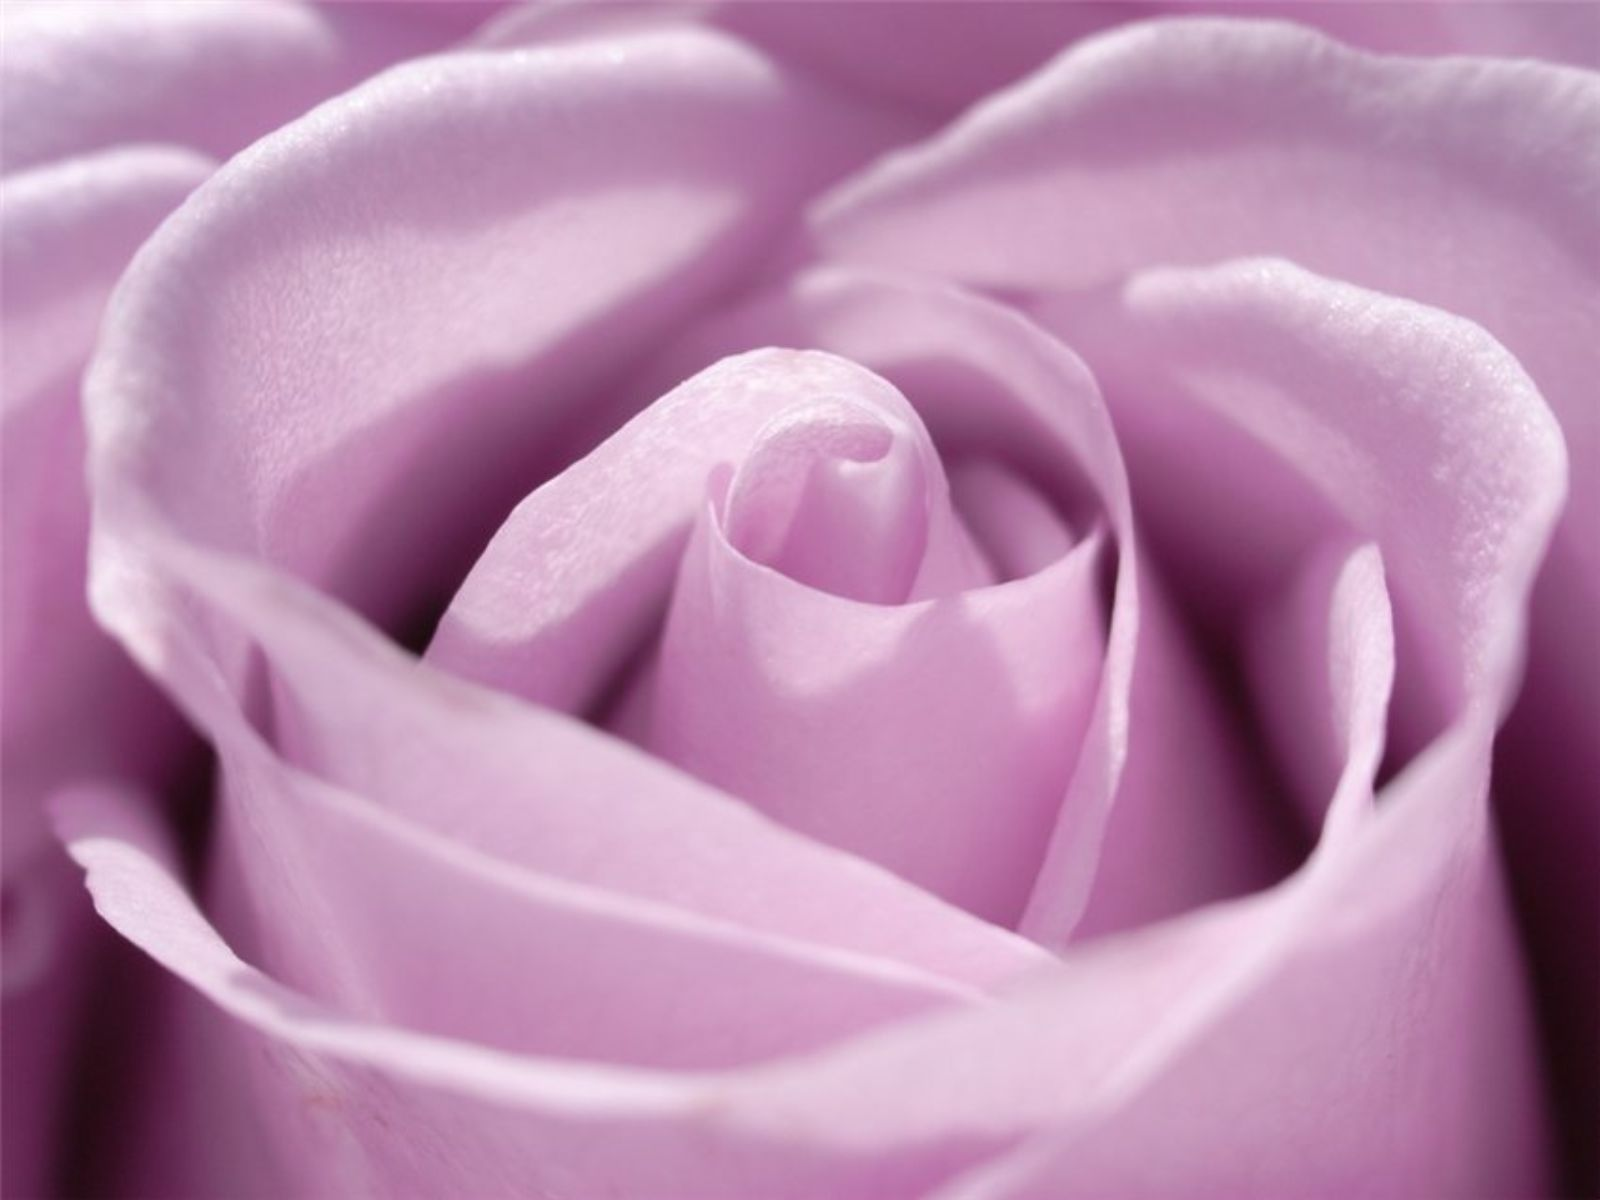 Purple and Pink Roses Wallpaper | Purple Rose Wallpaper - Colors Wallpaper (34511861) - Fanpop fanclubs